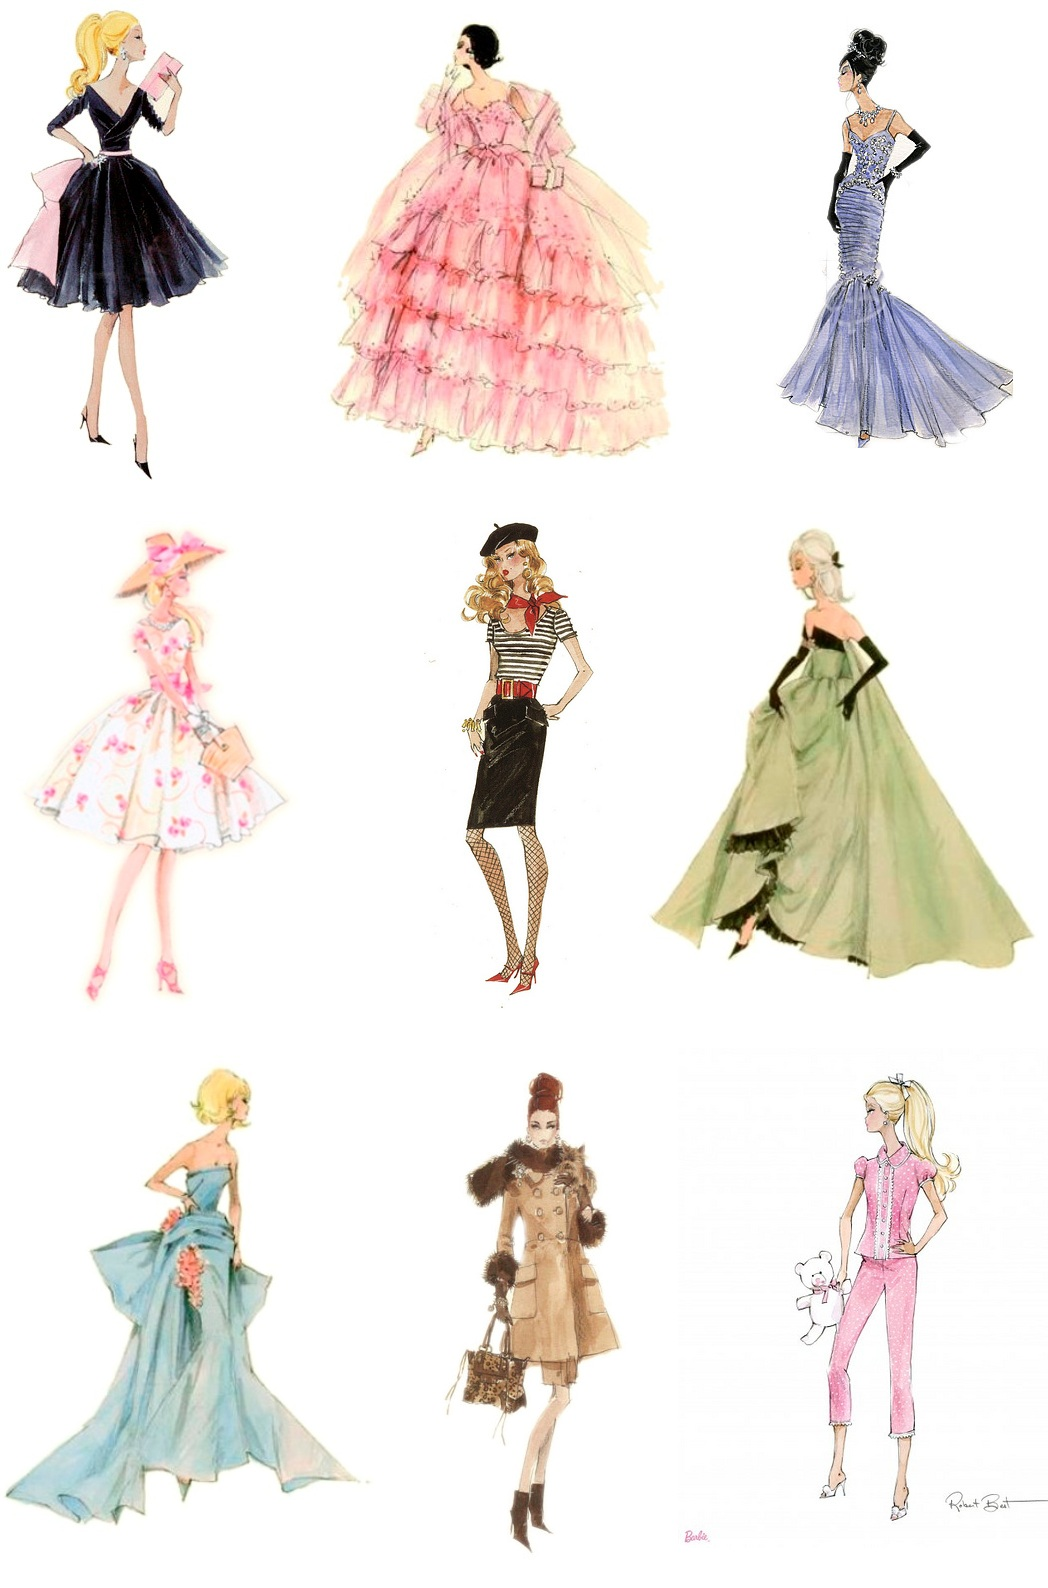 Drawn barbie frock Best Friend Barbie's Friend Barbie's